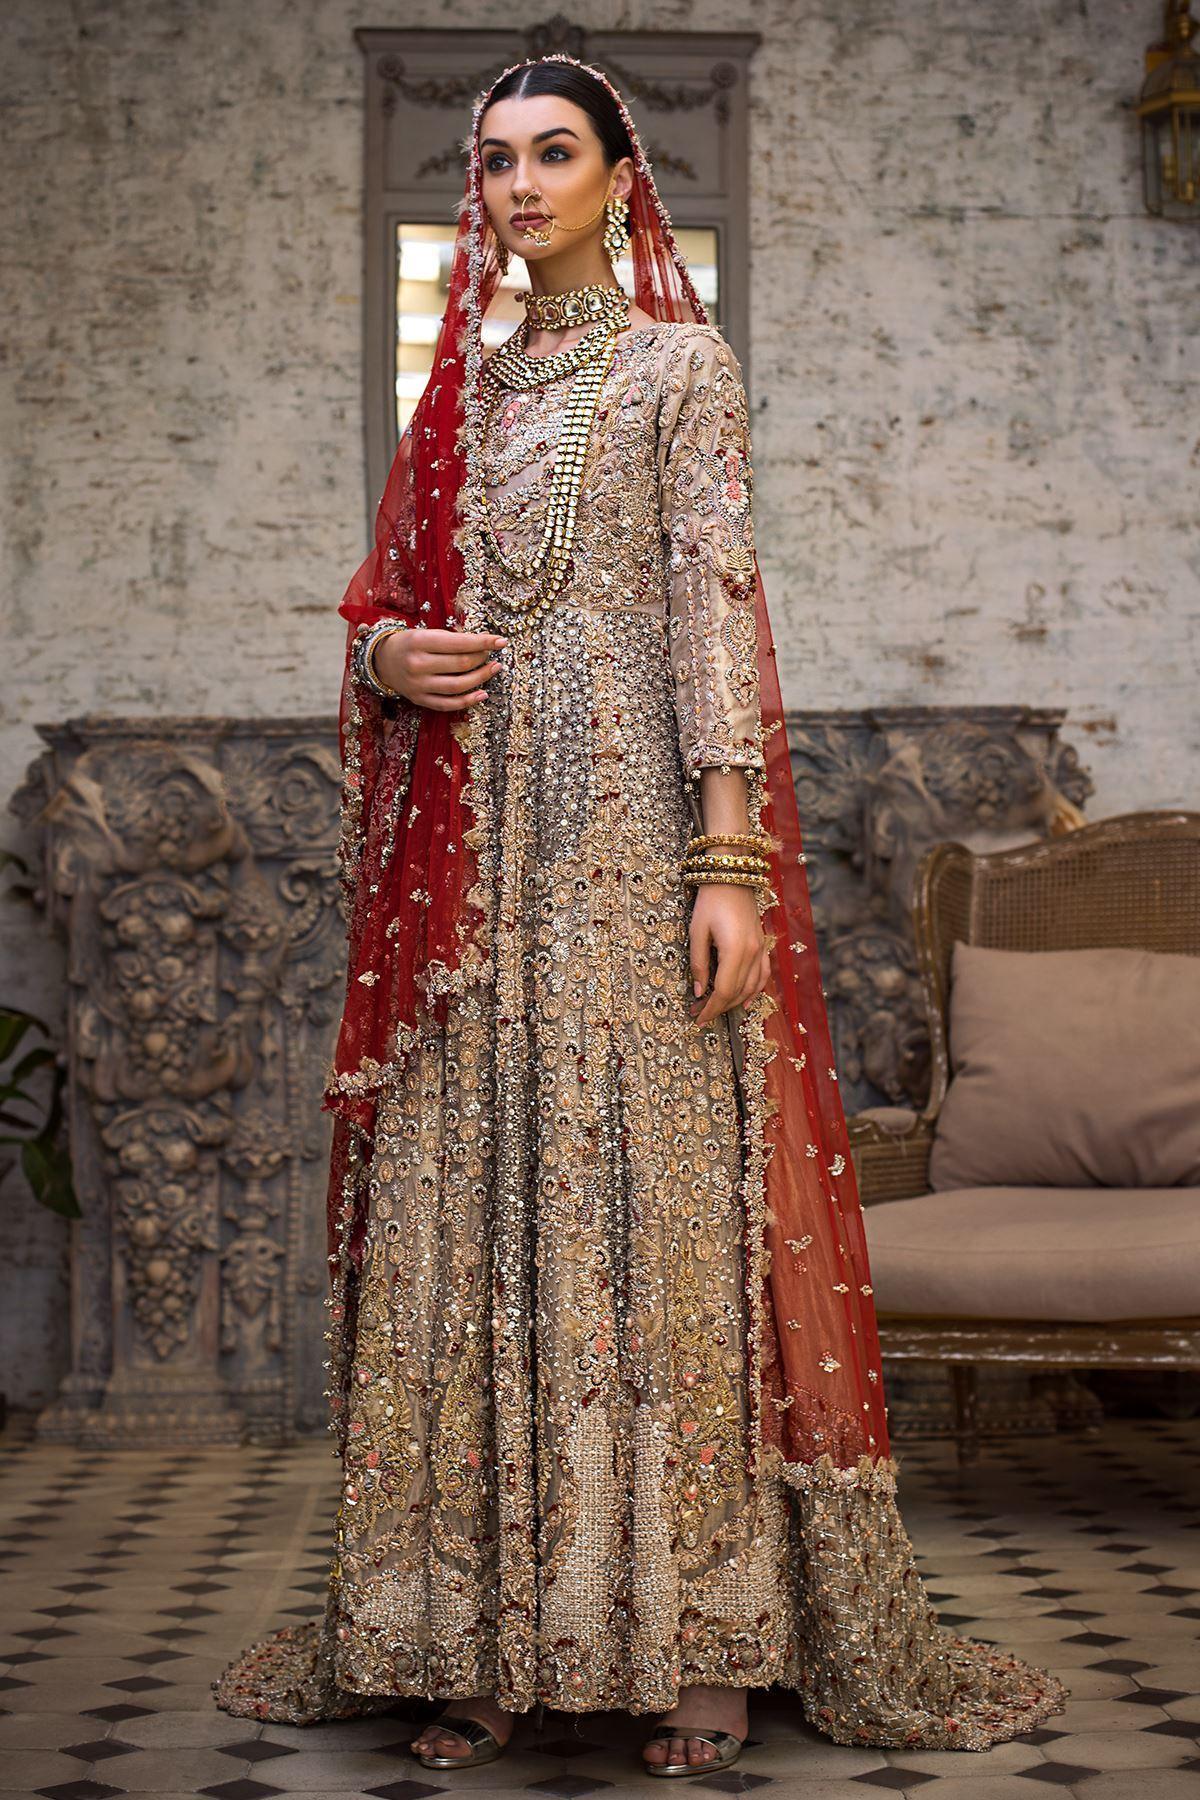 Moazzam khan Bridal Party Wear Tail Net Maxi and Dupatta